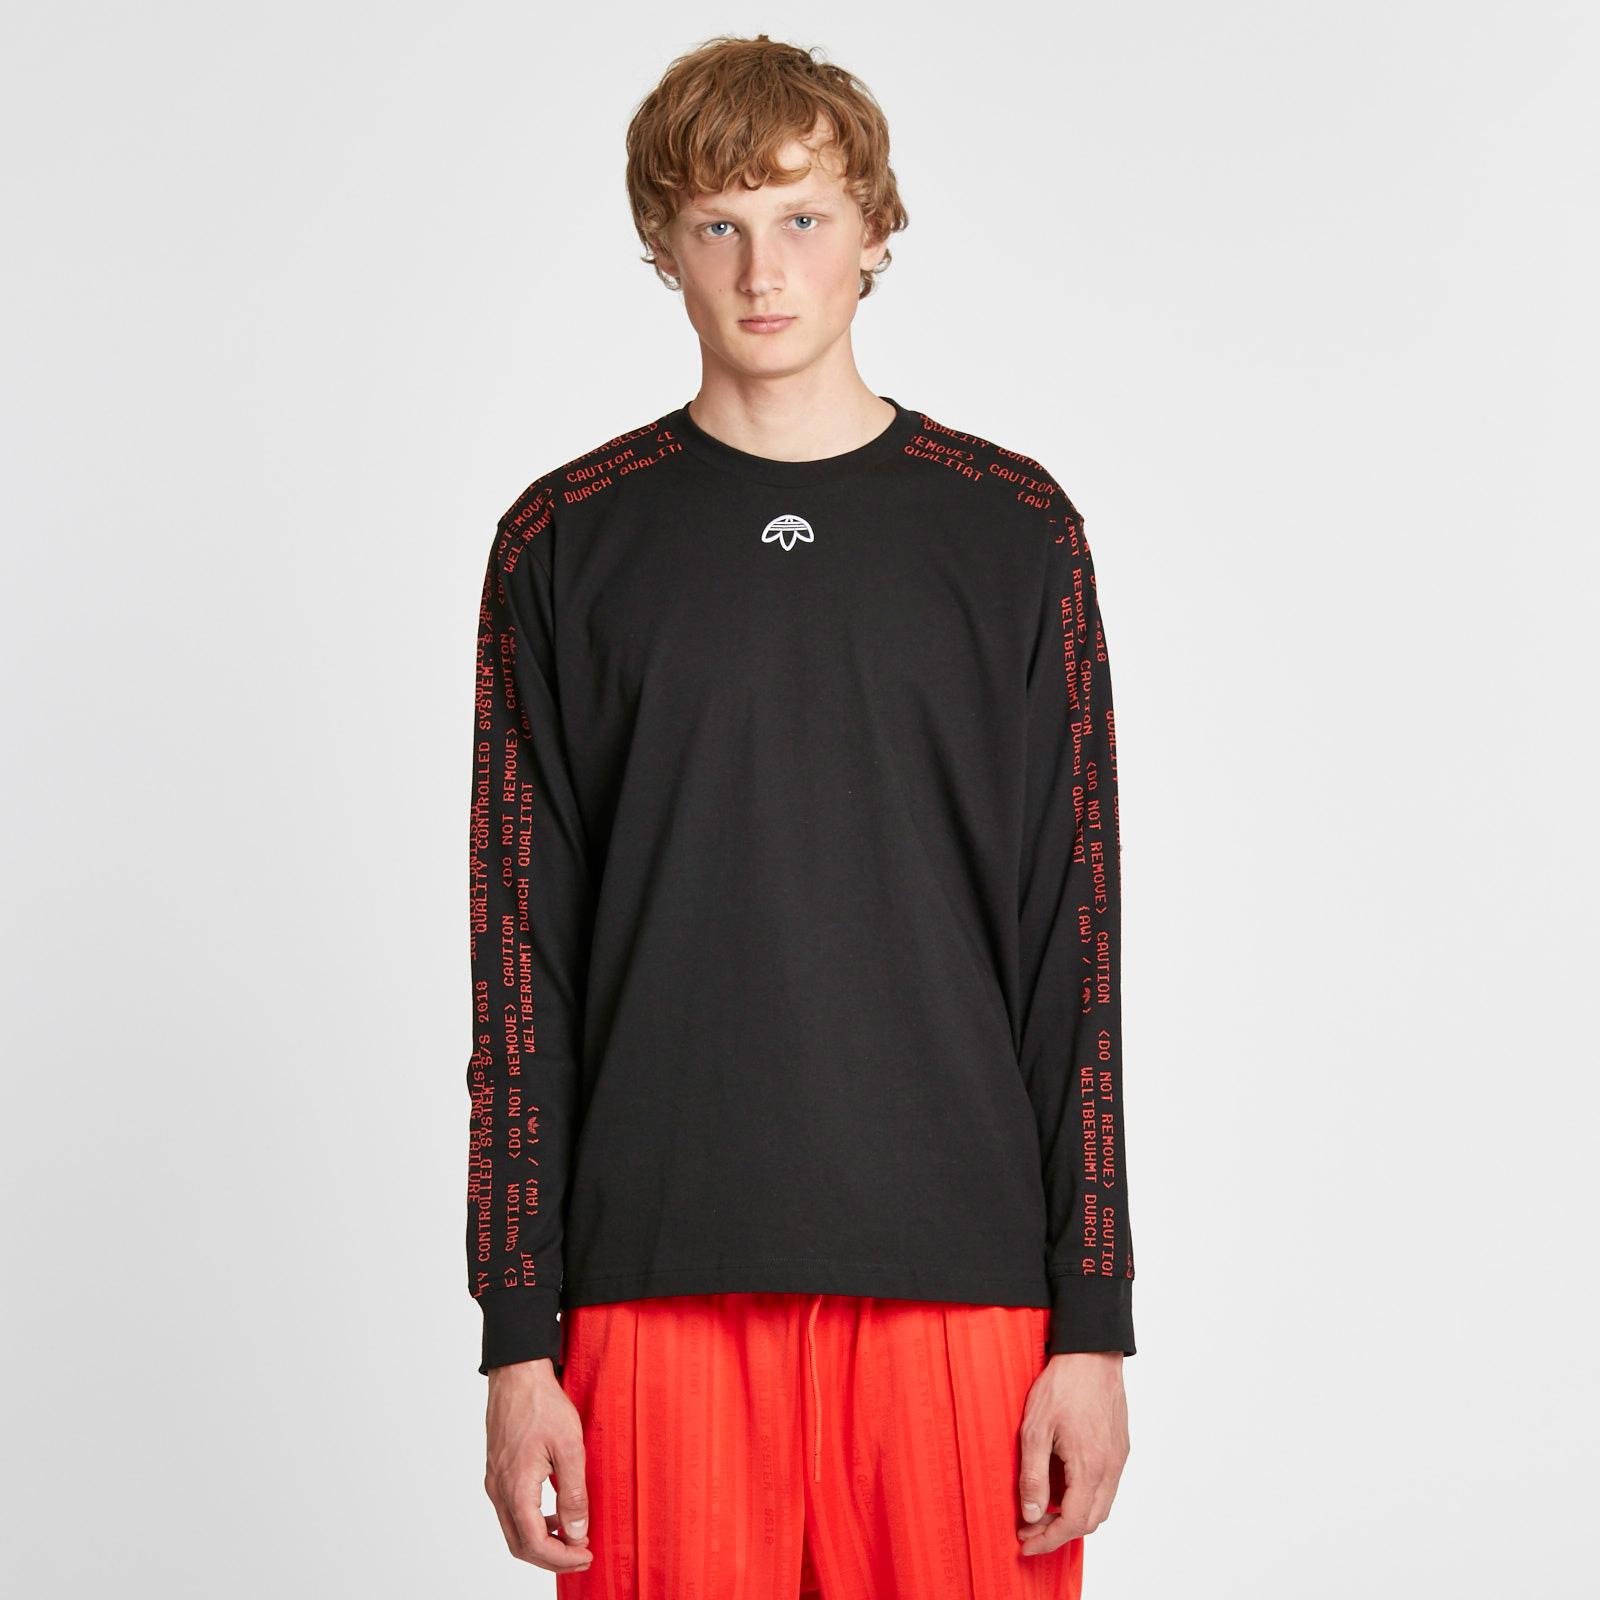 1b81289c5331 adidas Long Sleeve x Alexander Wang - Dm9690 - Sneakersnstuff ...